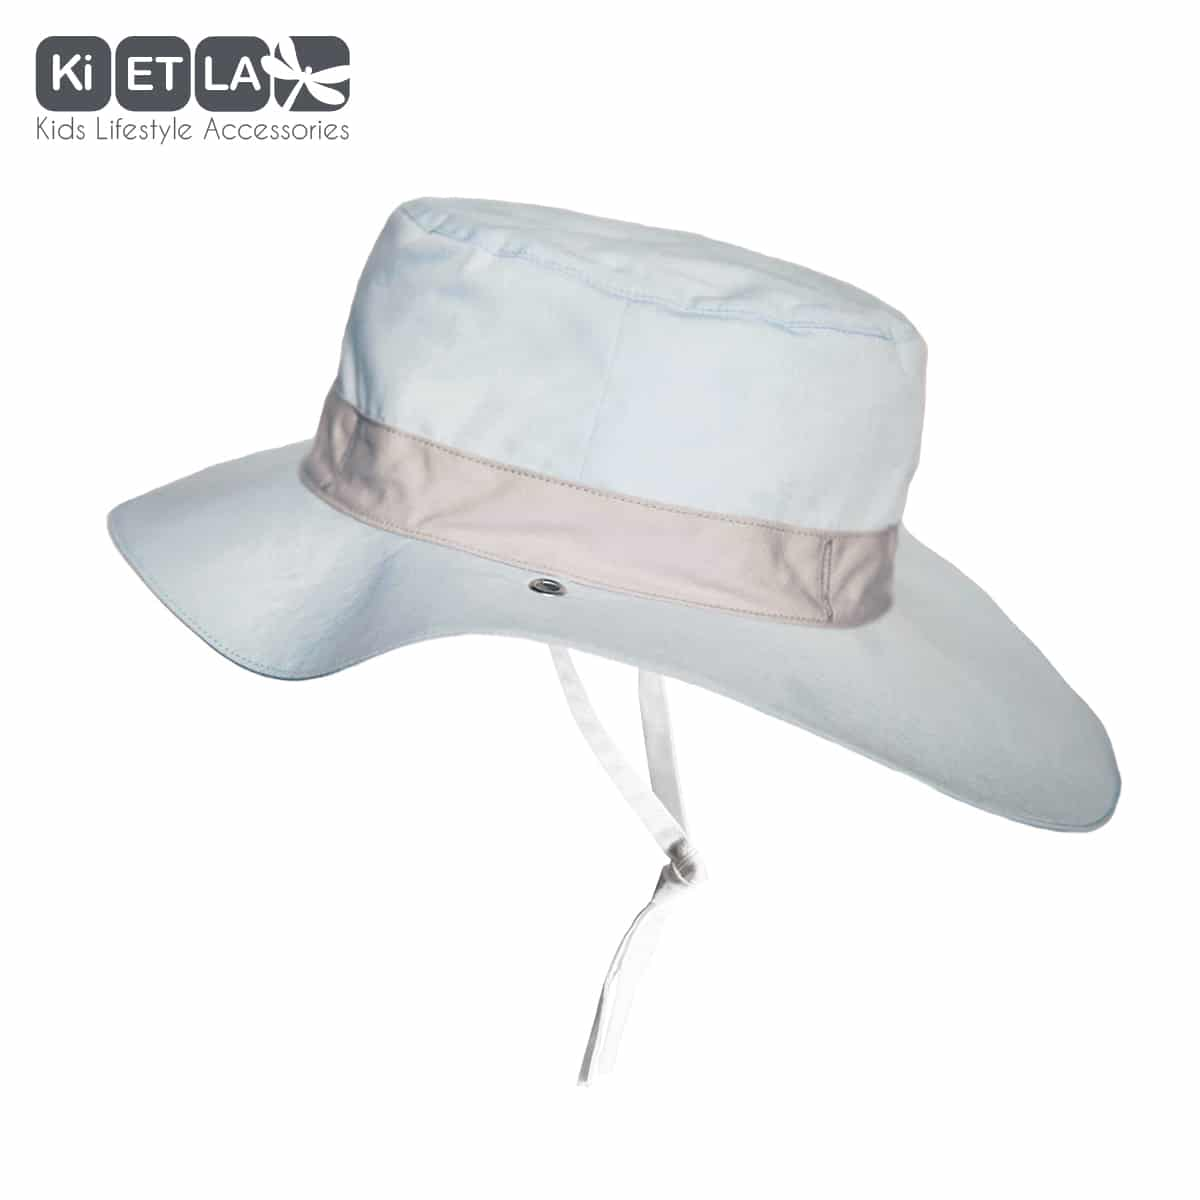 00c4b75e3427 KiETLA obojstranný klobúčik s UV ochranou - 52cm